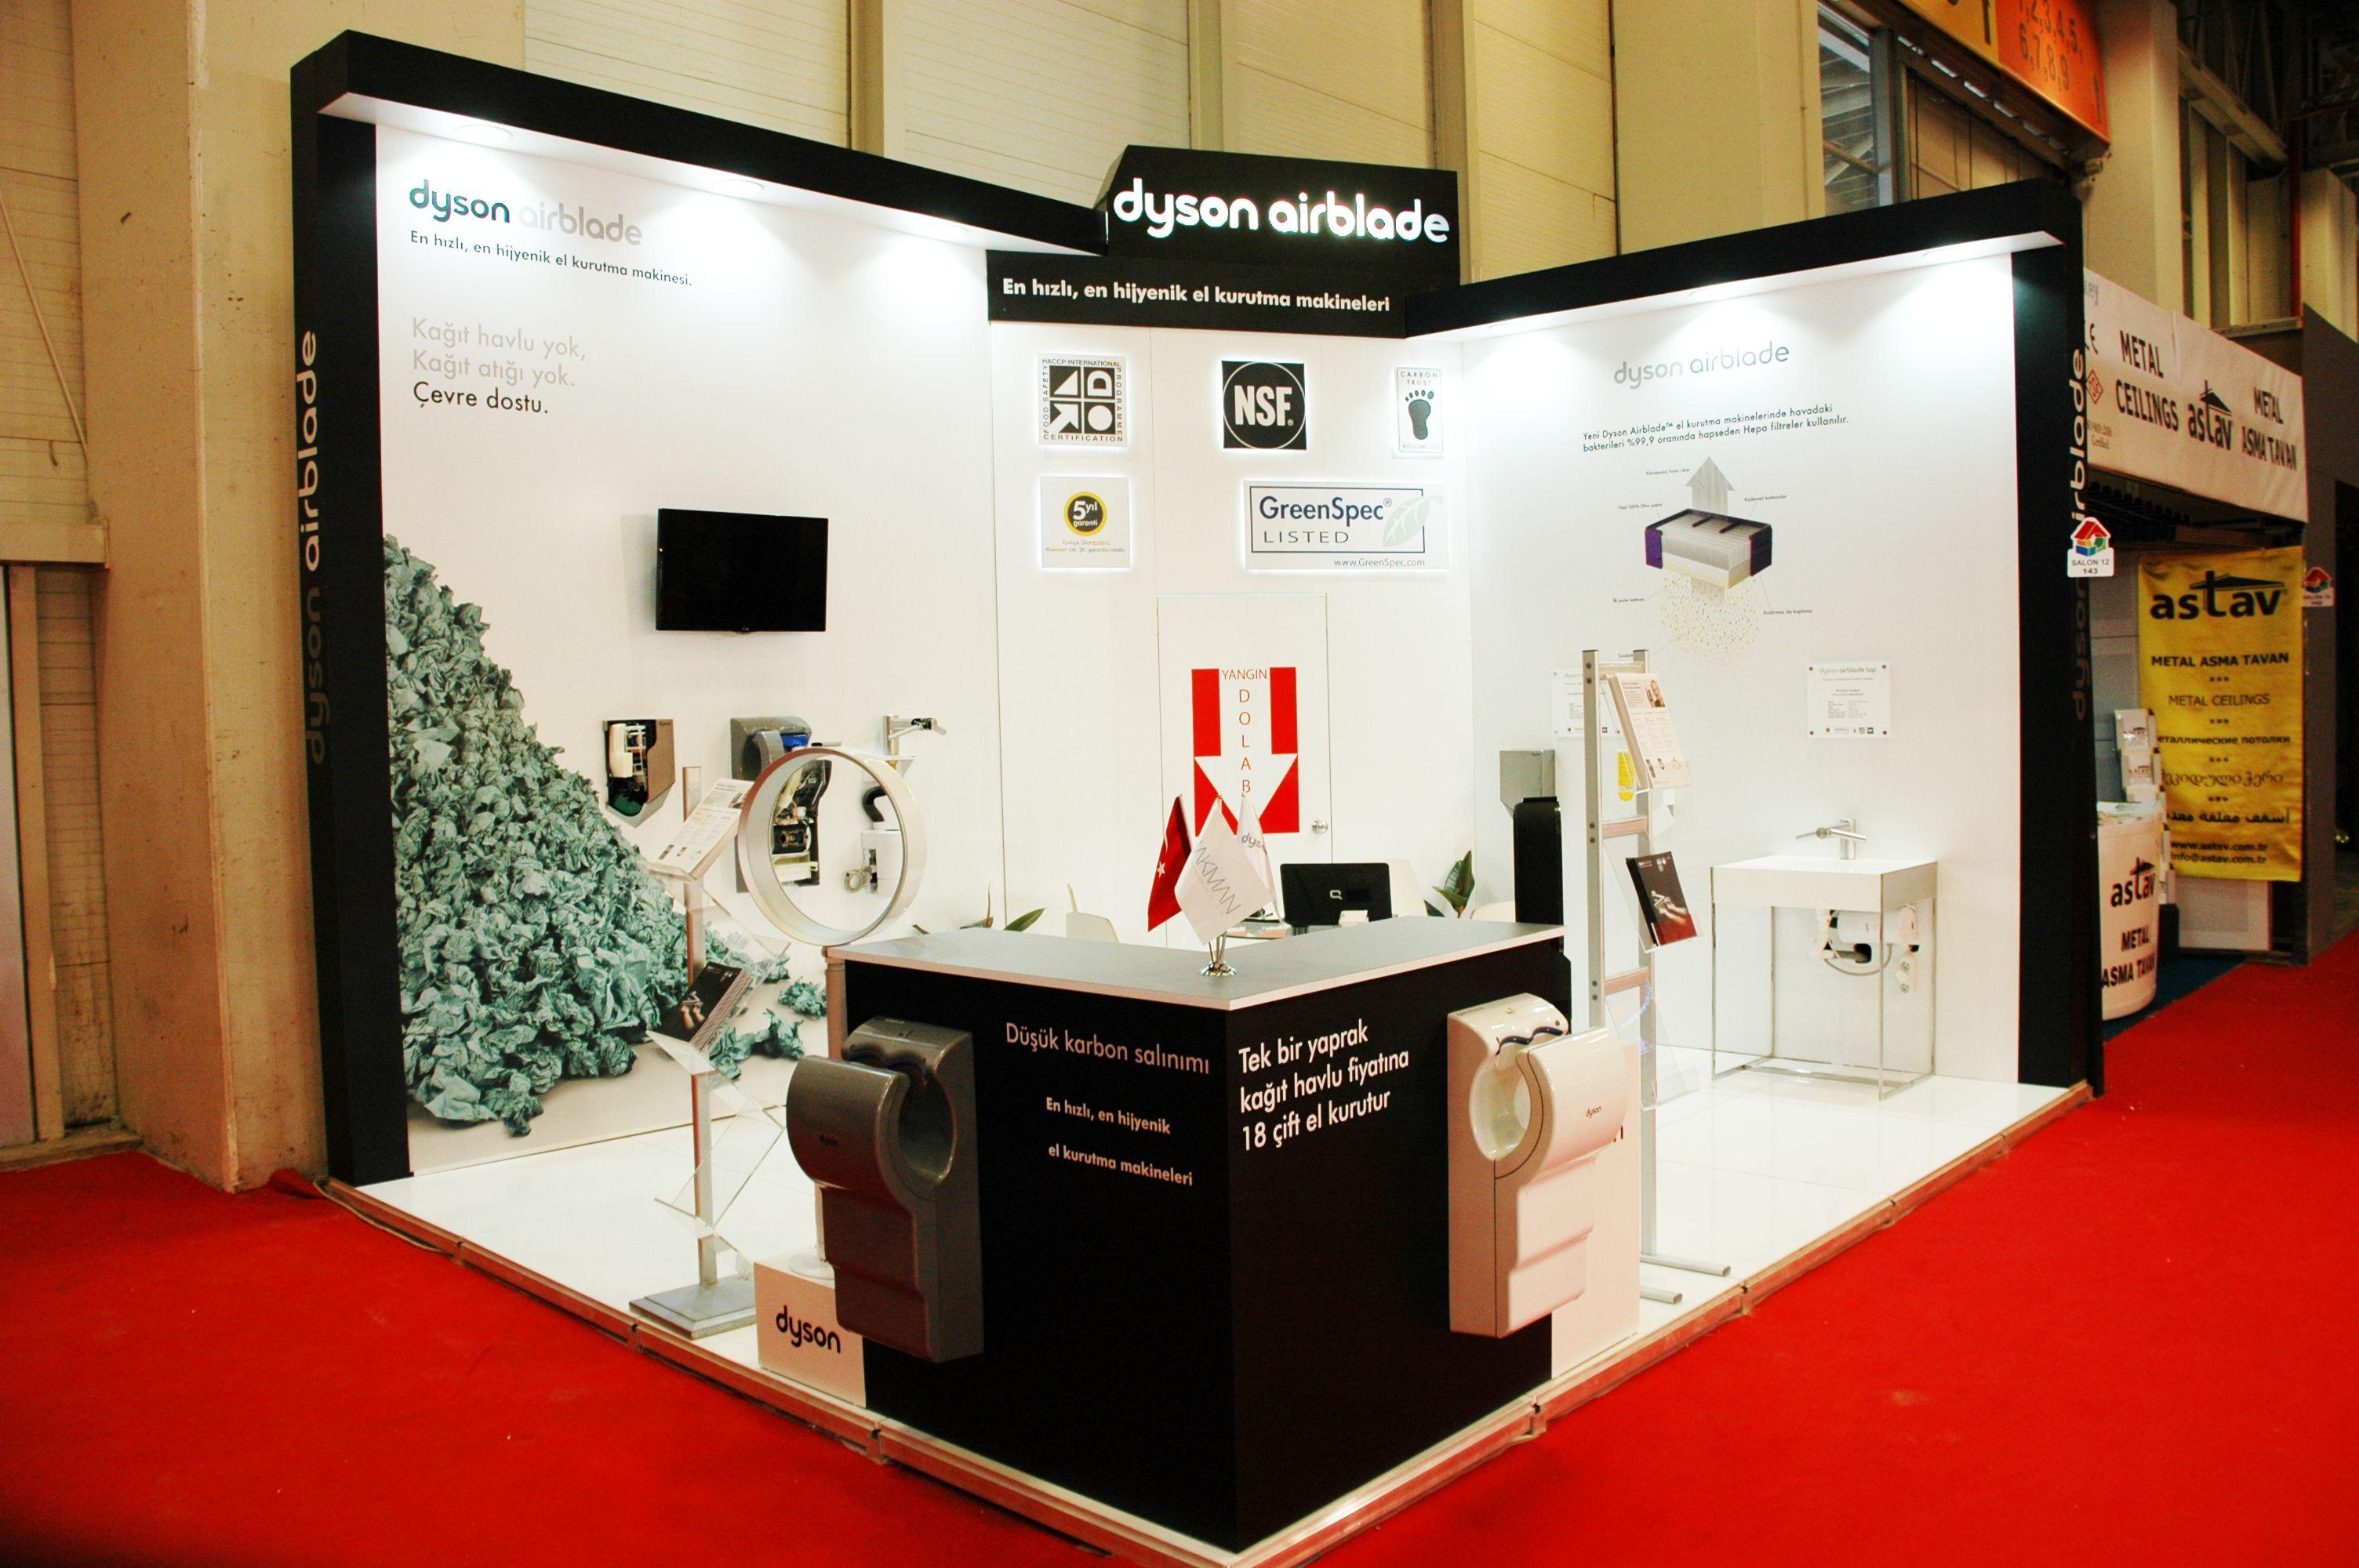 Exhibition Stand Stant : Yapifuari turkeybuild